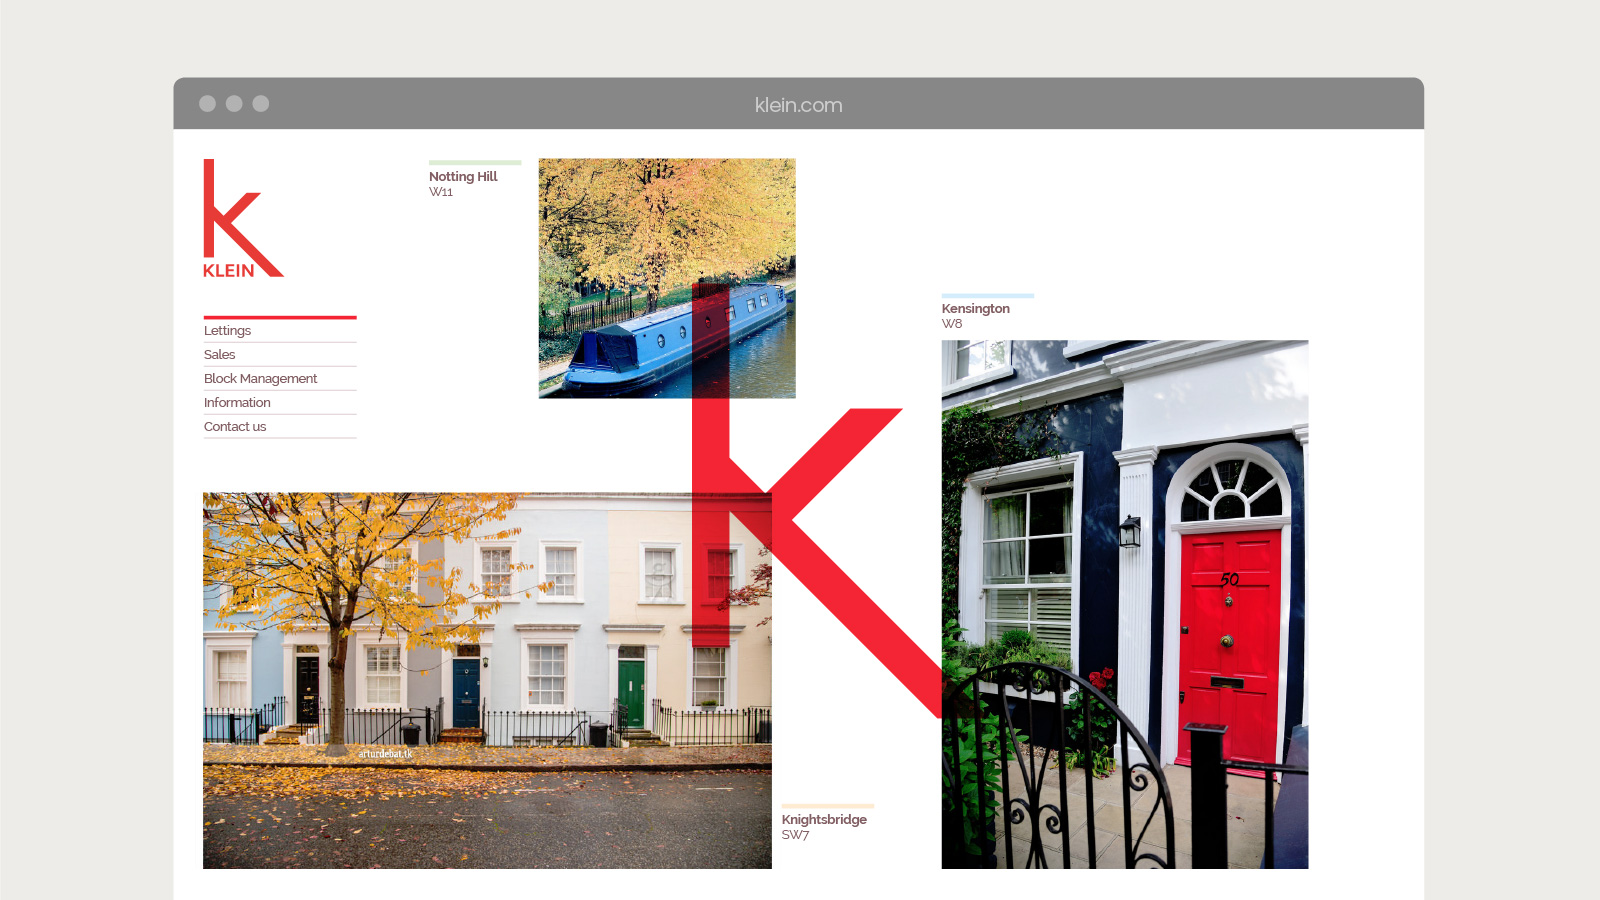 property-agency-visual-branding-identity-design-milton-keynes-london-13